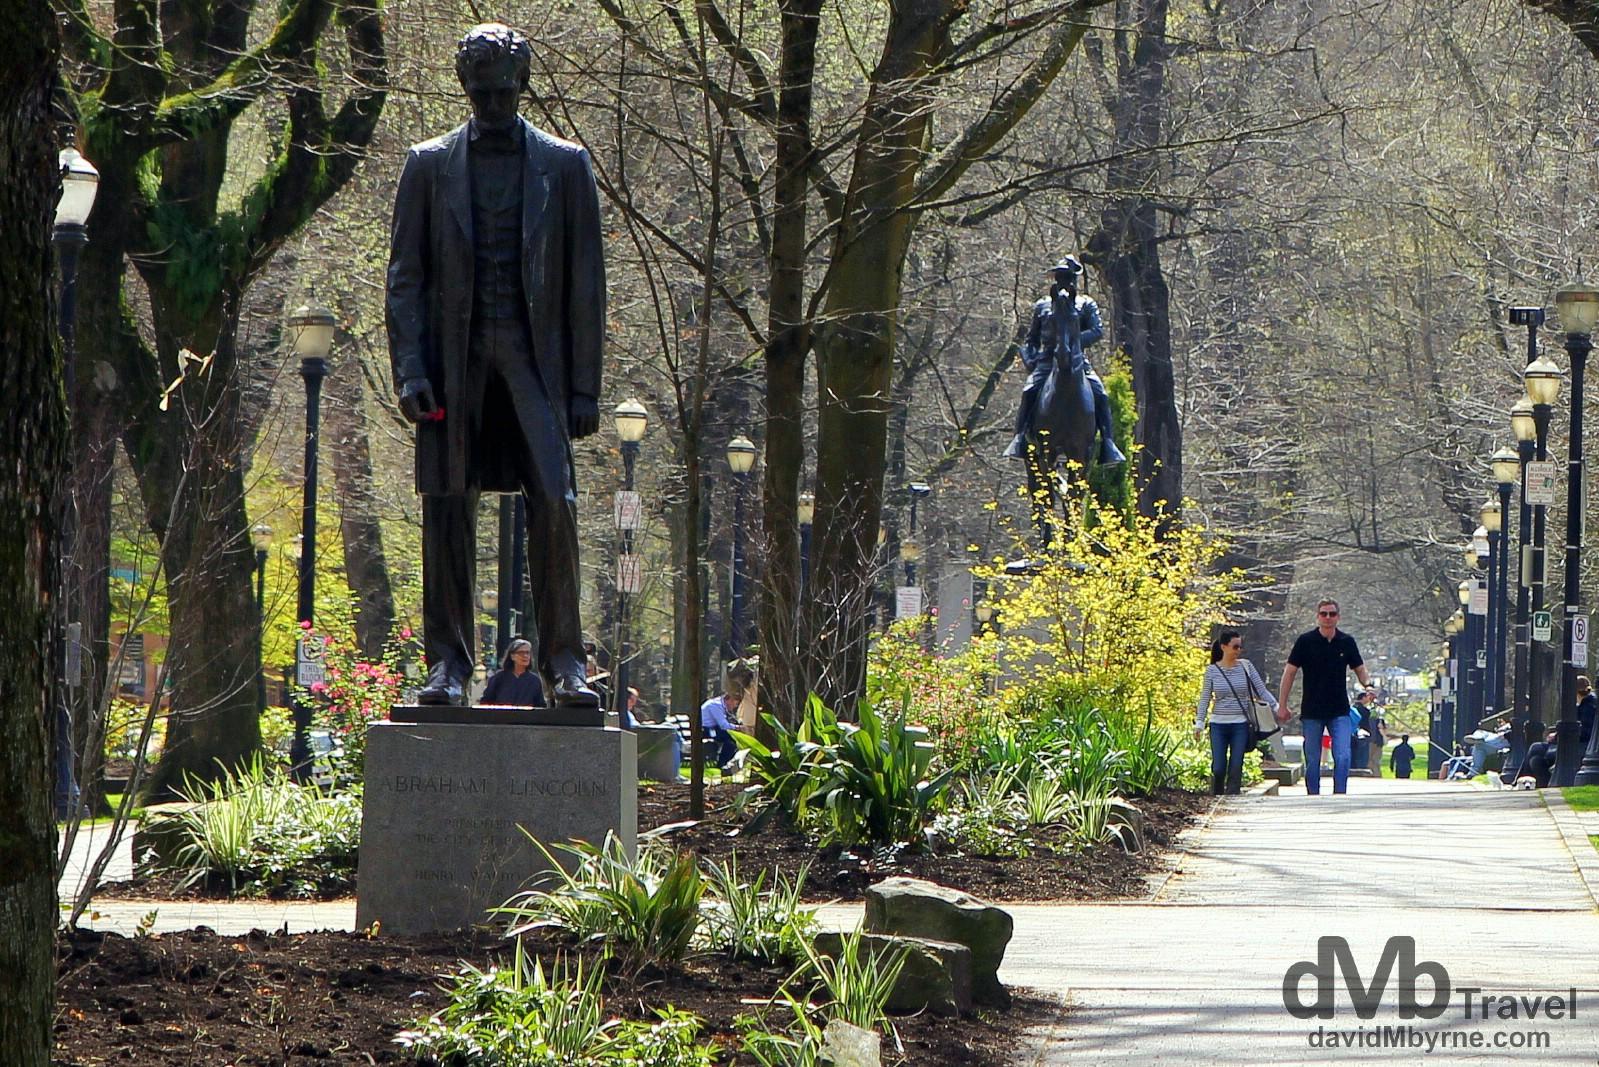 The Abraham Lincoln statue in South Park Blocks, Portland Oregon, USA. March 28, 2013.